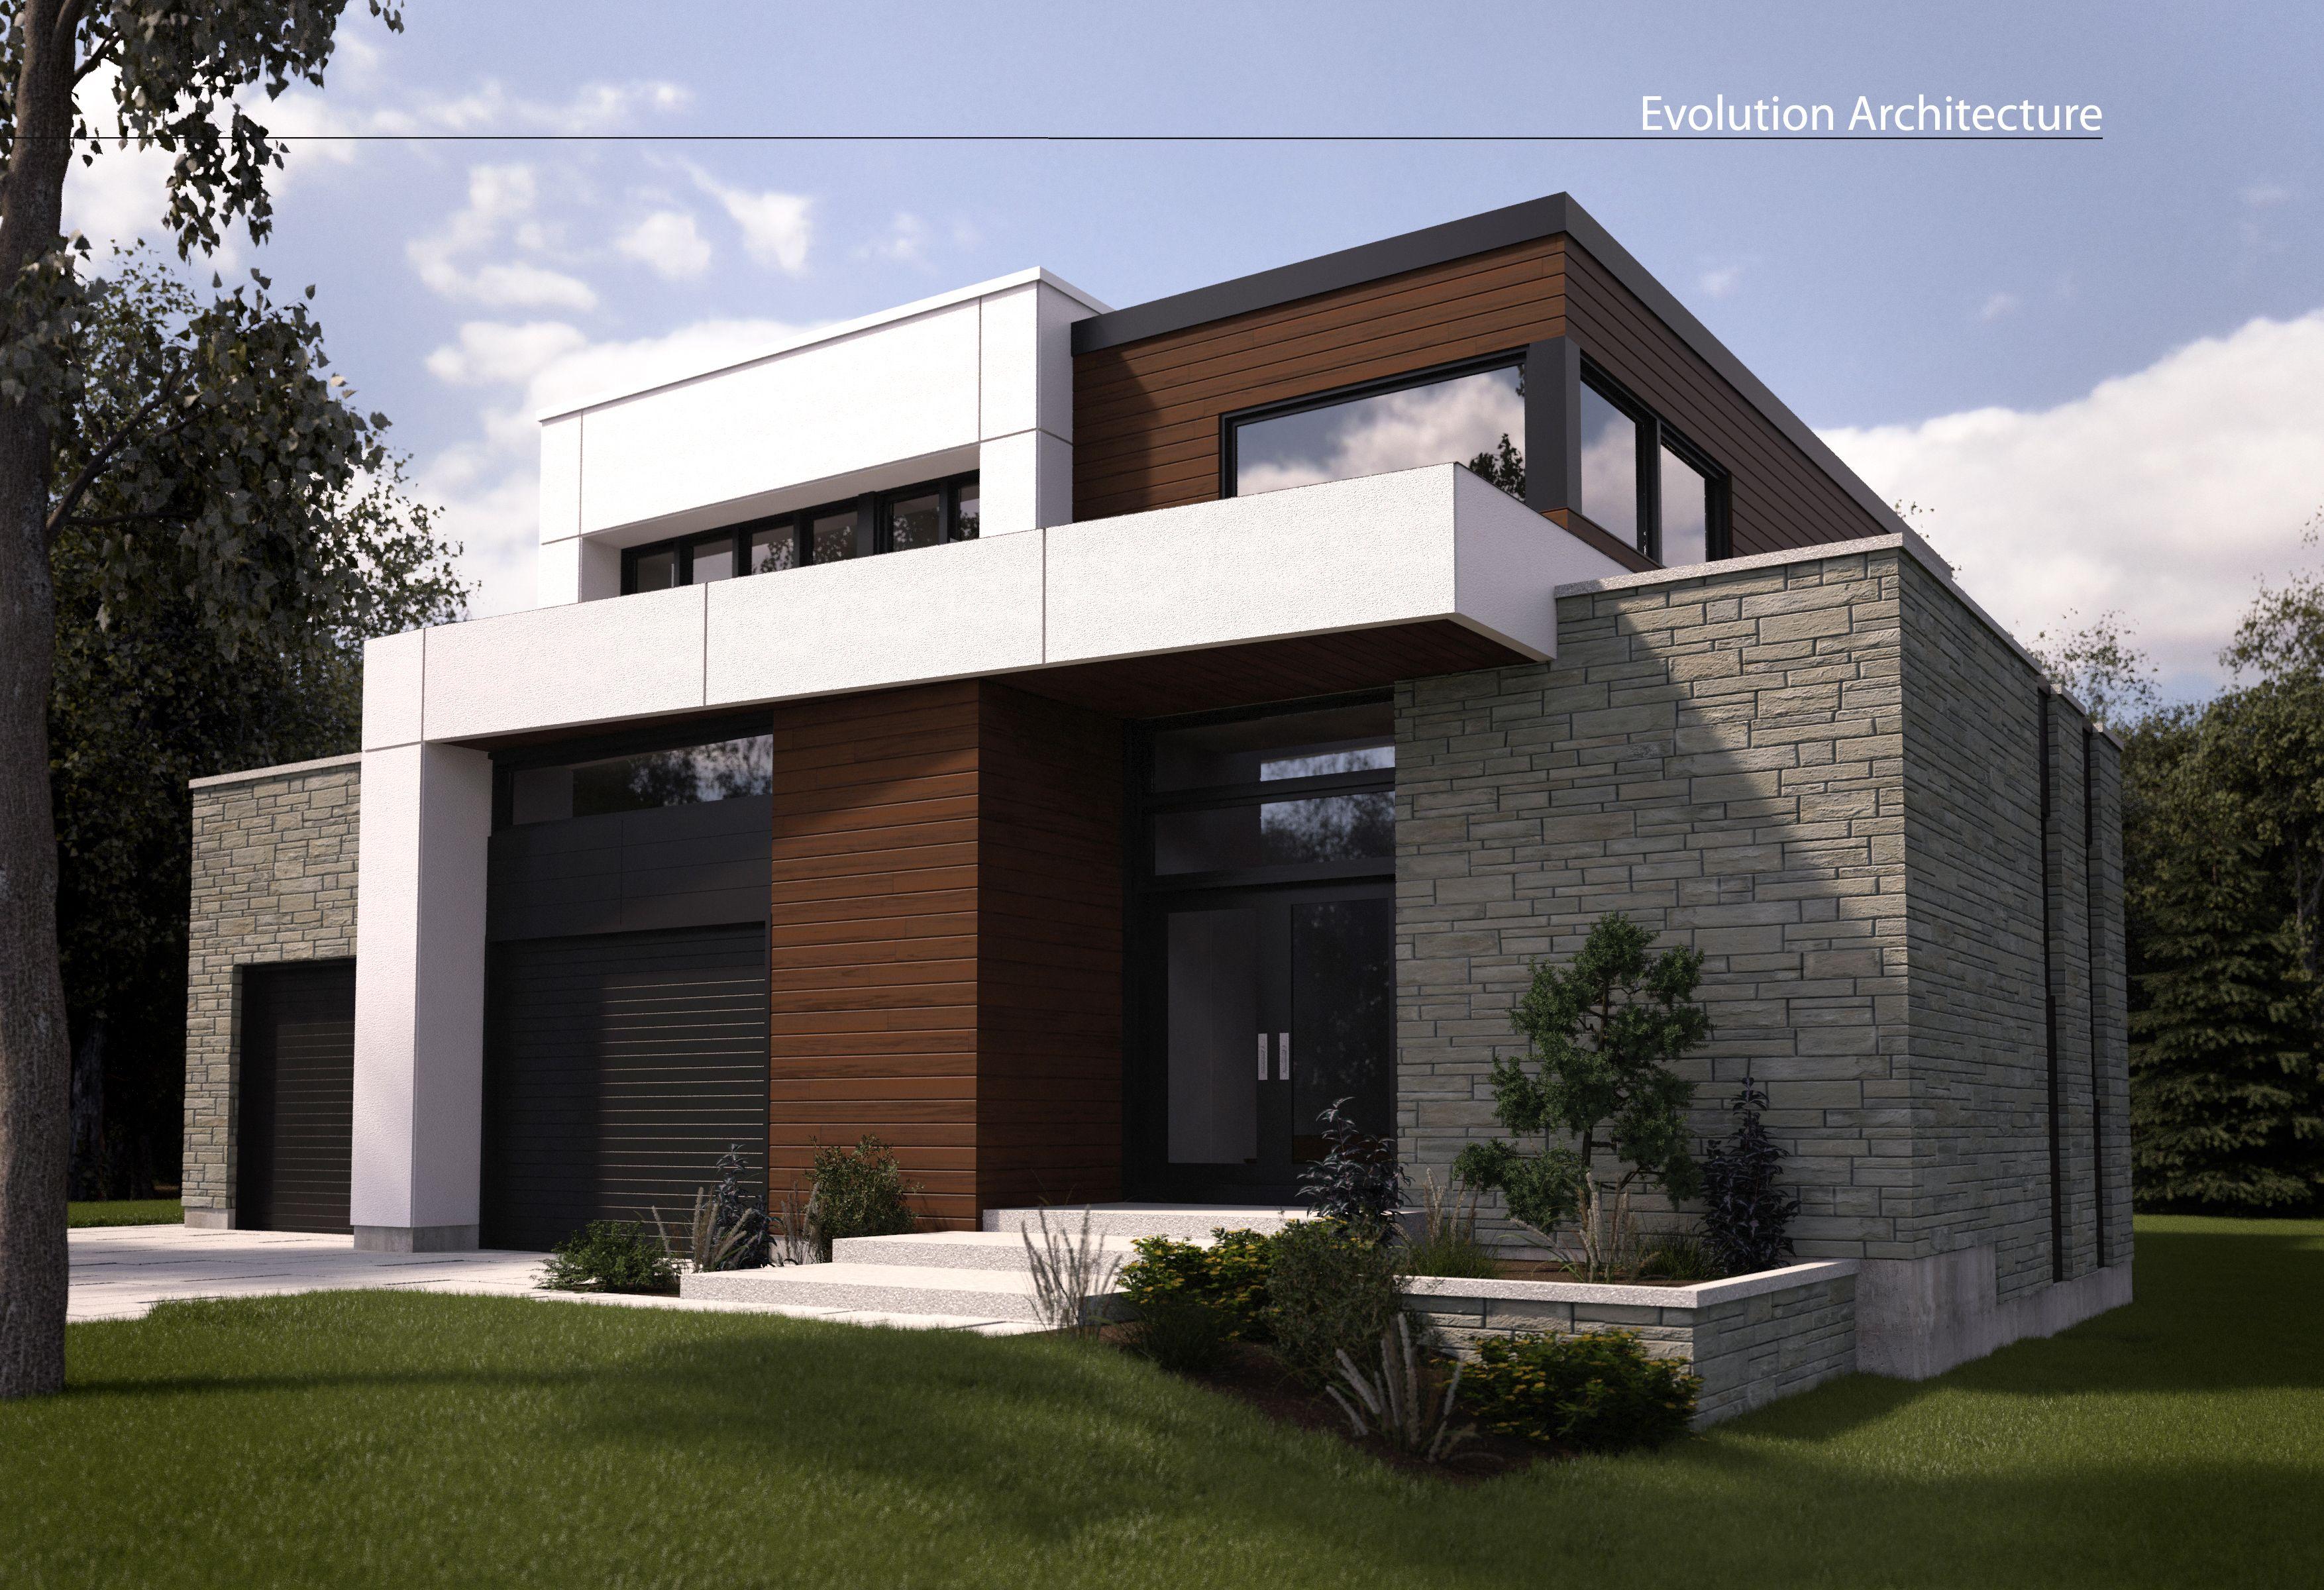 Evolution Architecturemaison modernecration exclusive E898  Villa pro  Modular home